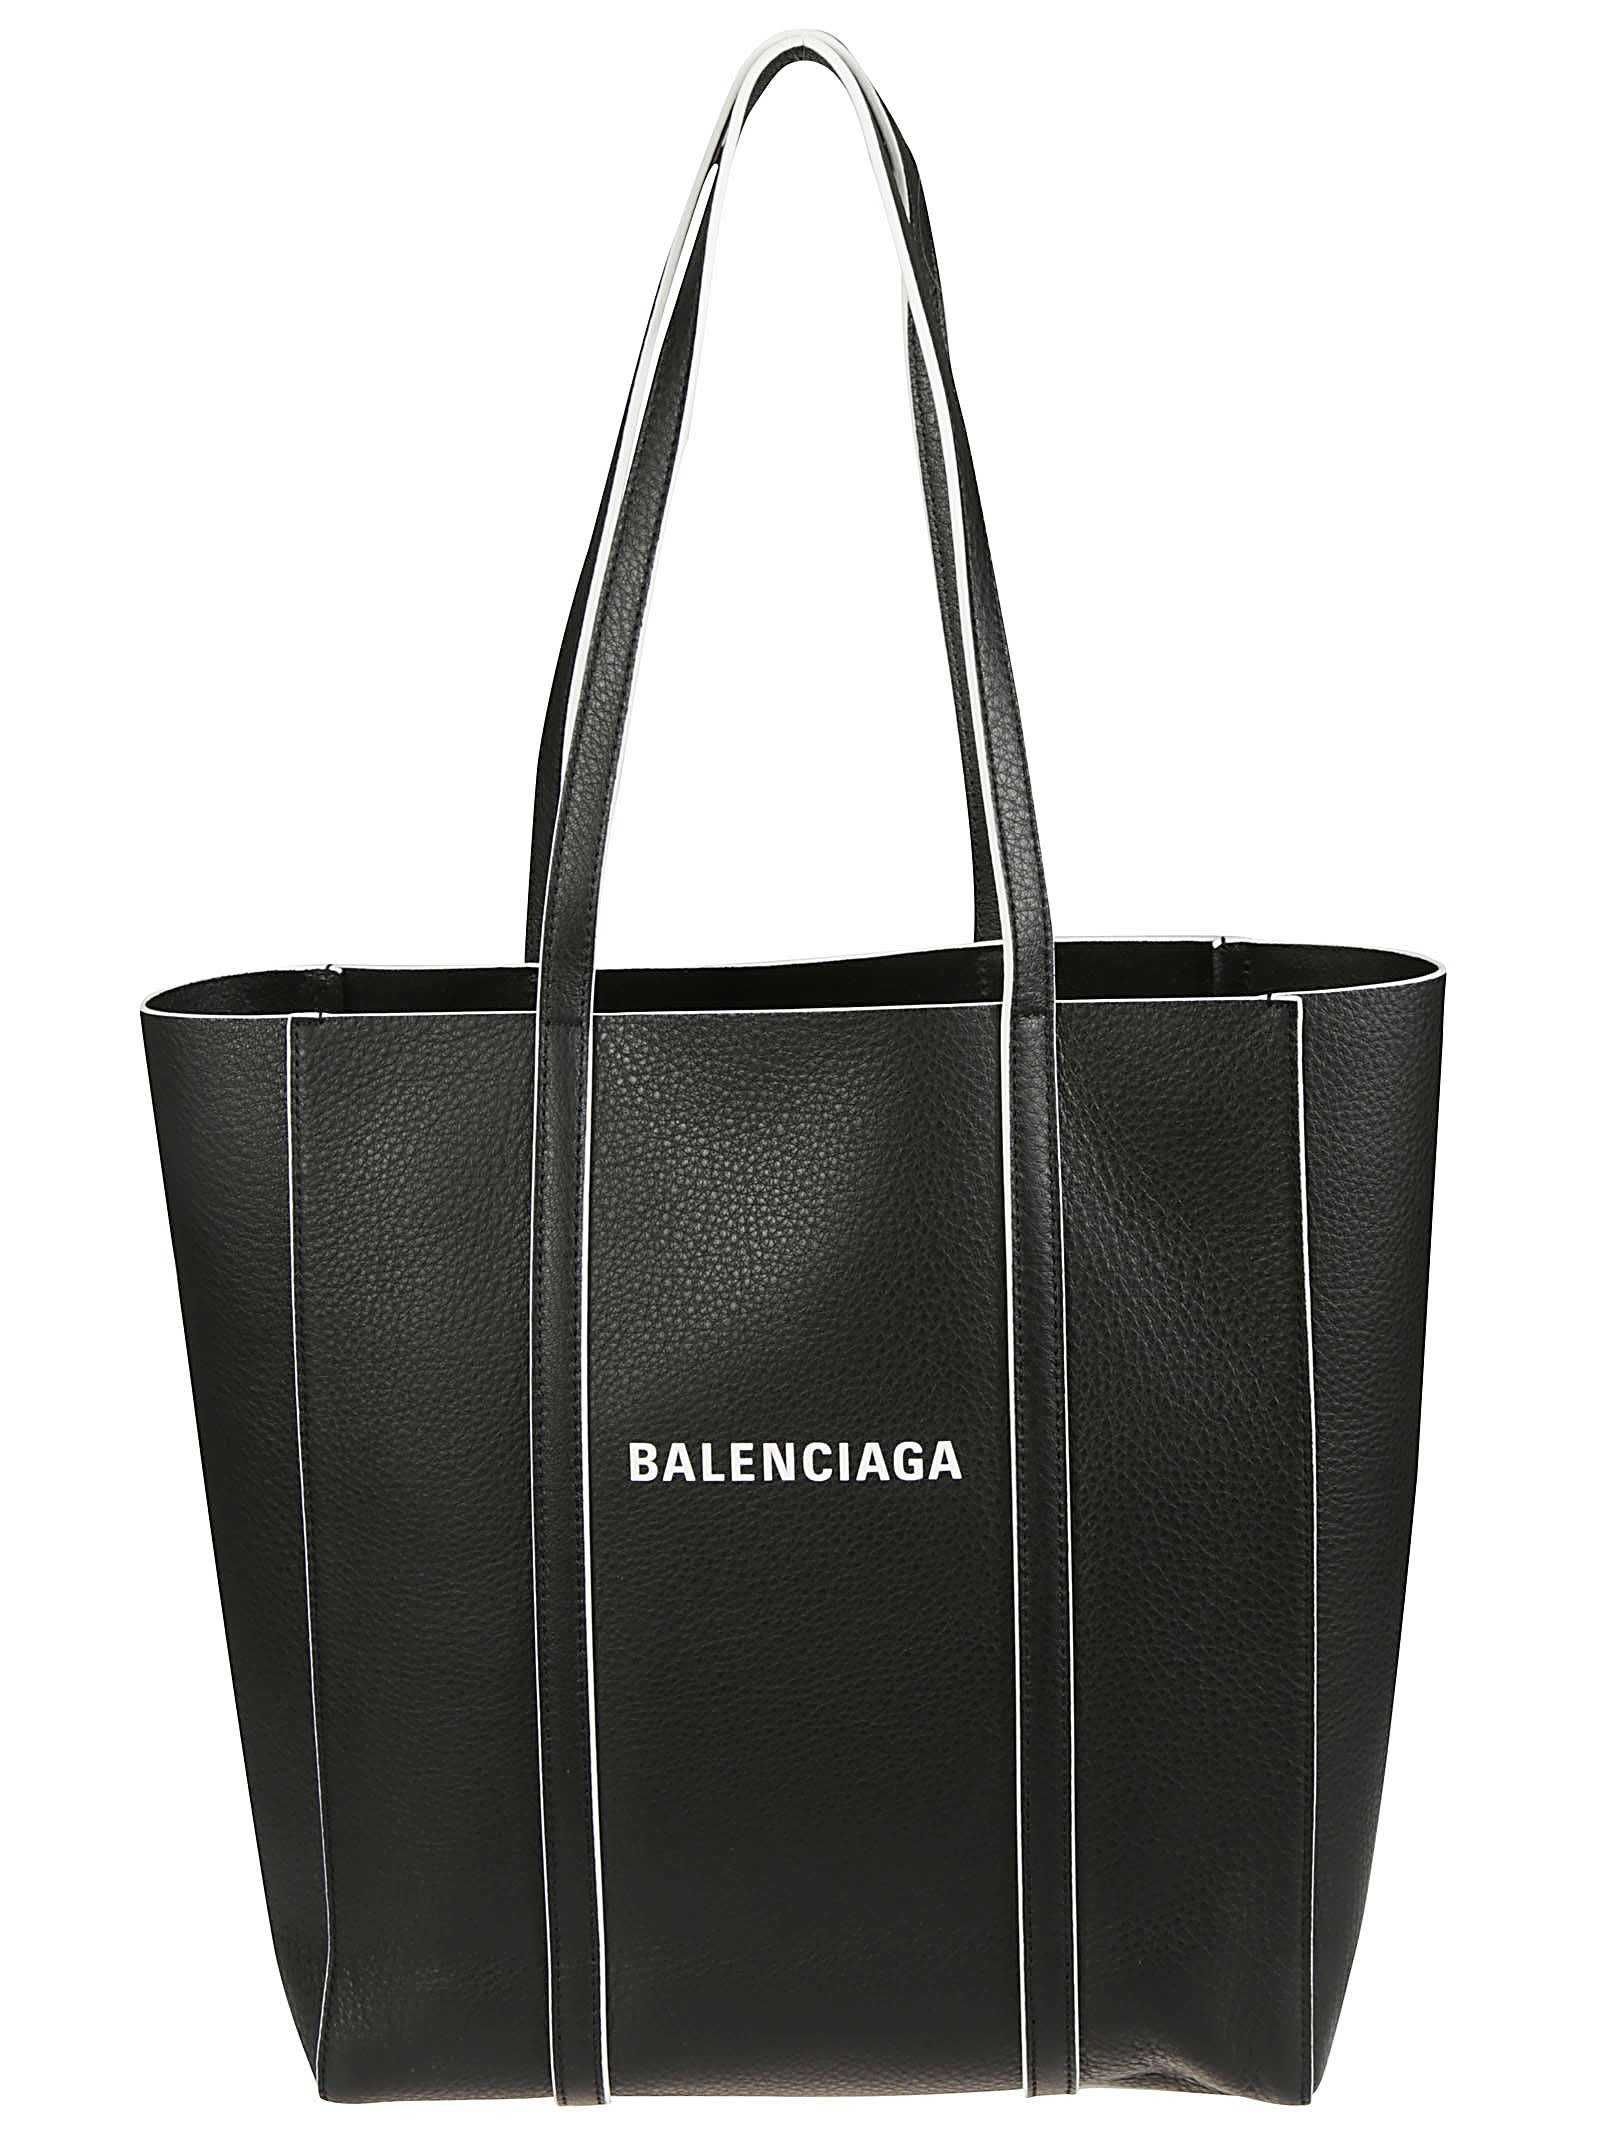 Balenciaga Everyday Tote In Black/white